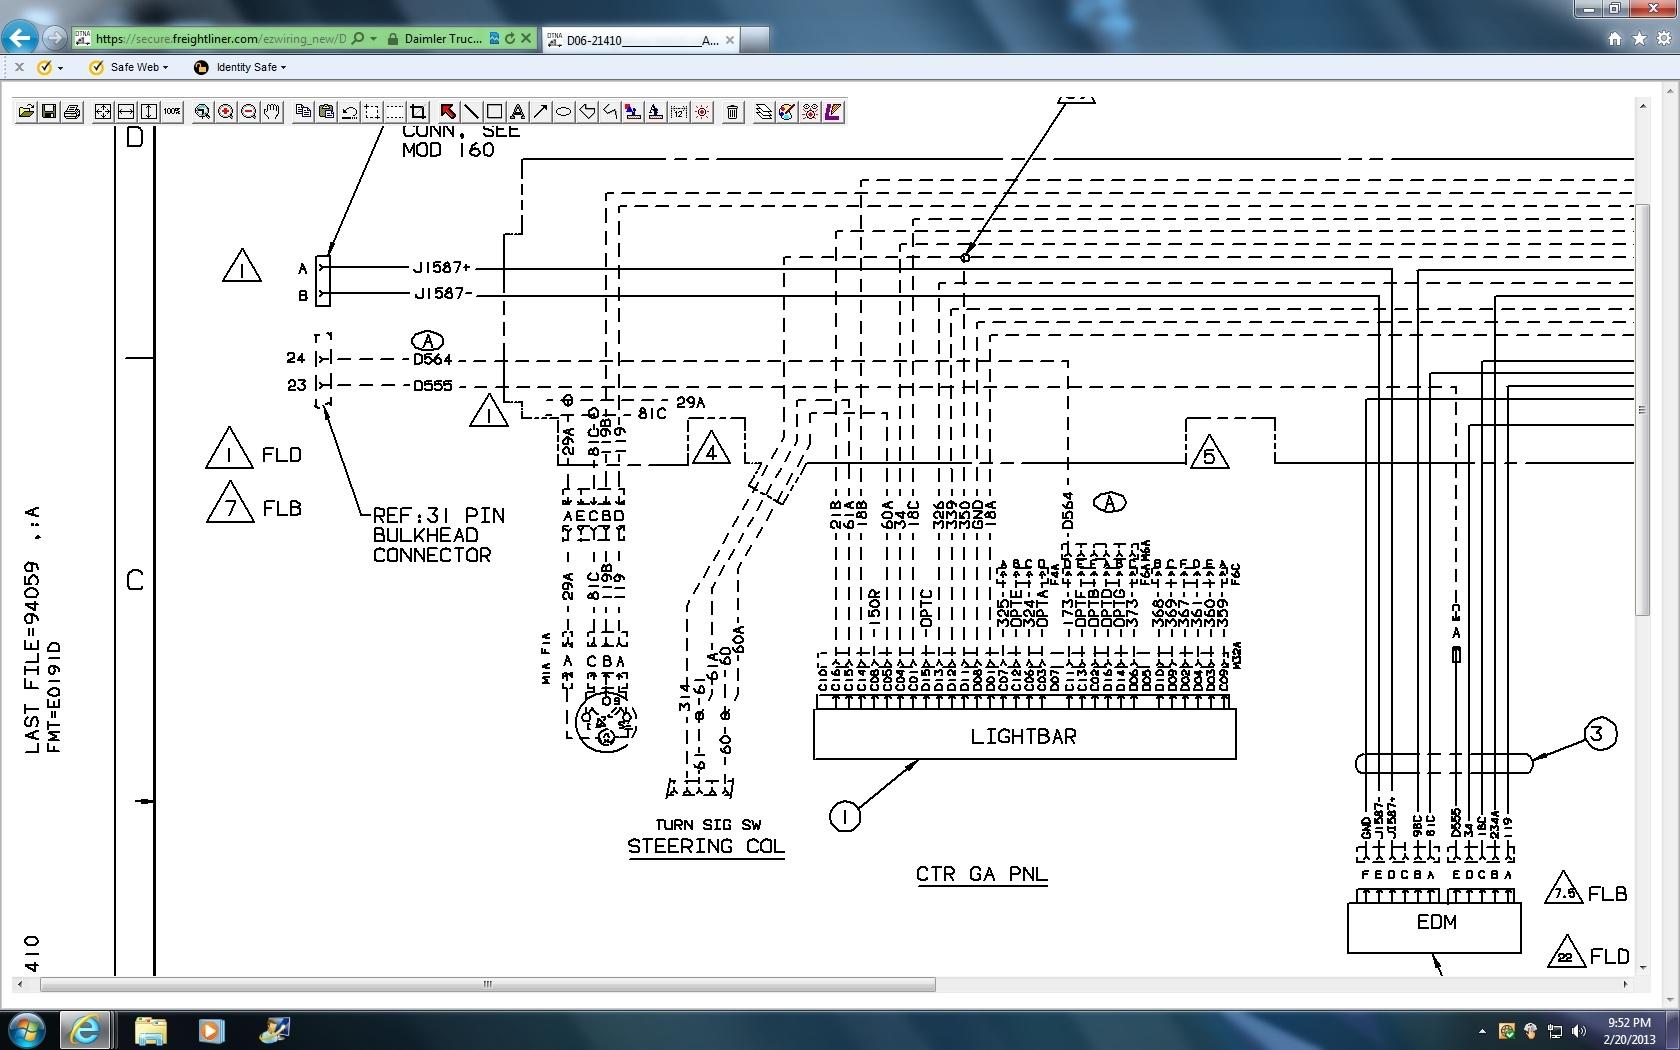 Detroit Series 60 Ecm Wiring Diagram | Free Wiring Diagram